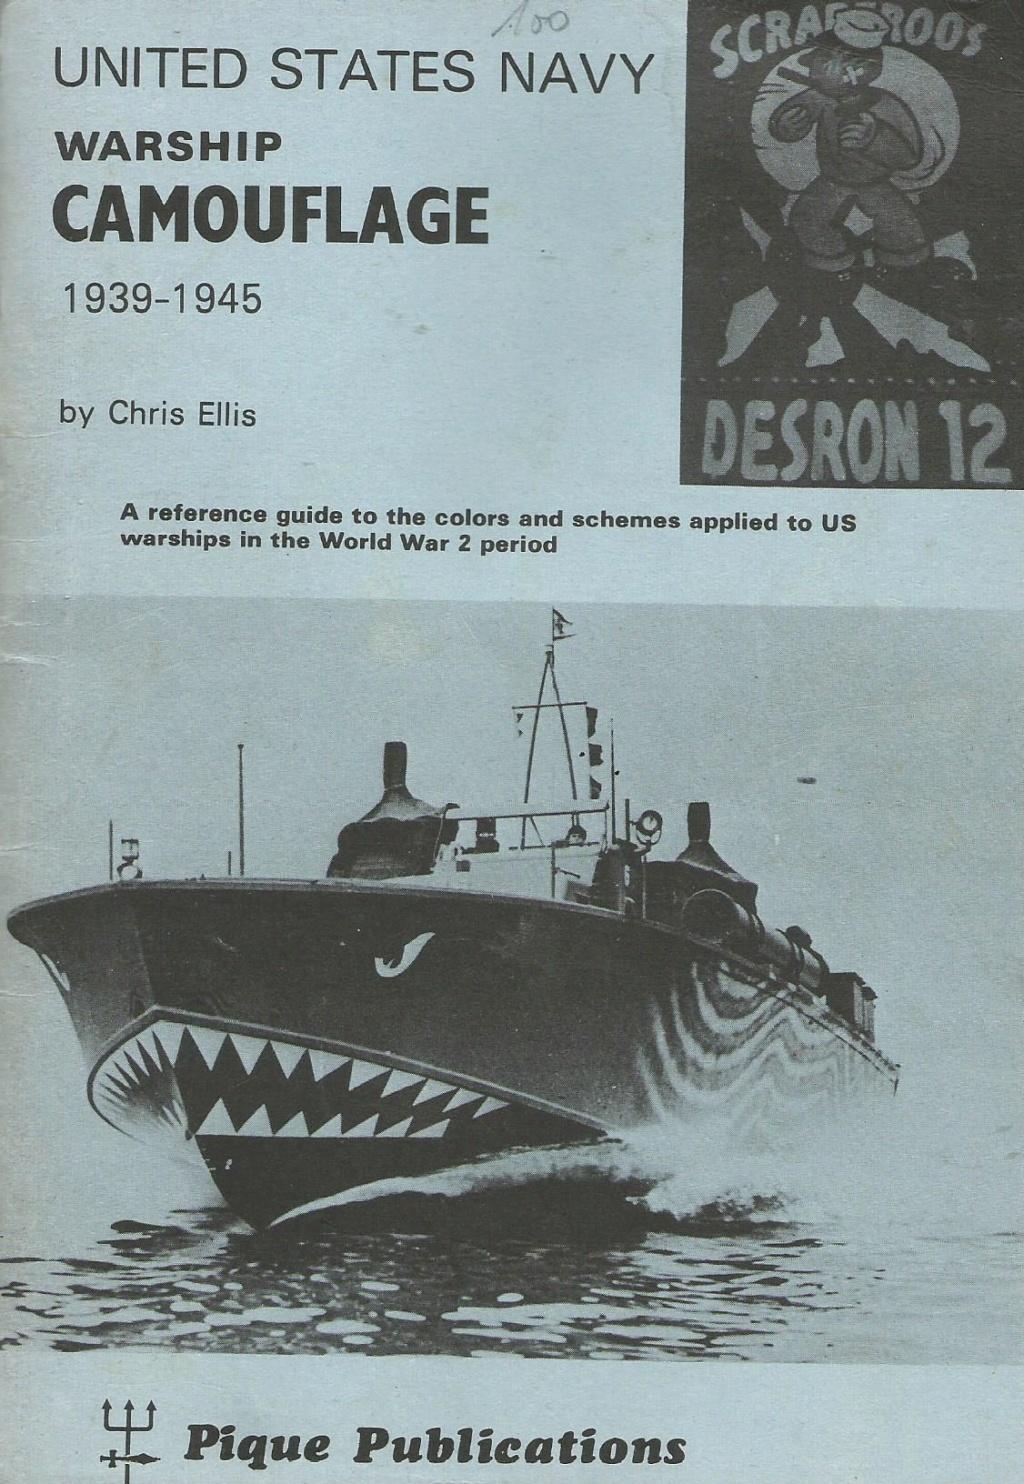 Mesures réglementires de camouflages US Navy 1939 - 1945 - Page 3 Camouf10